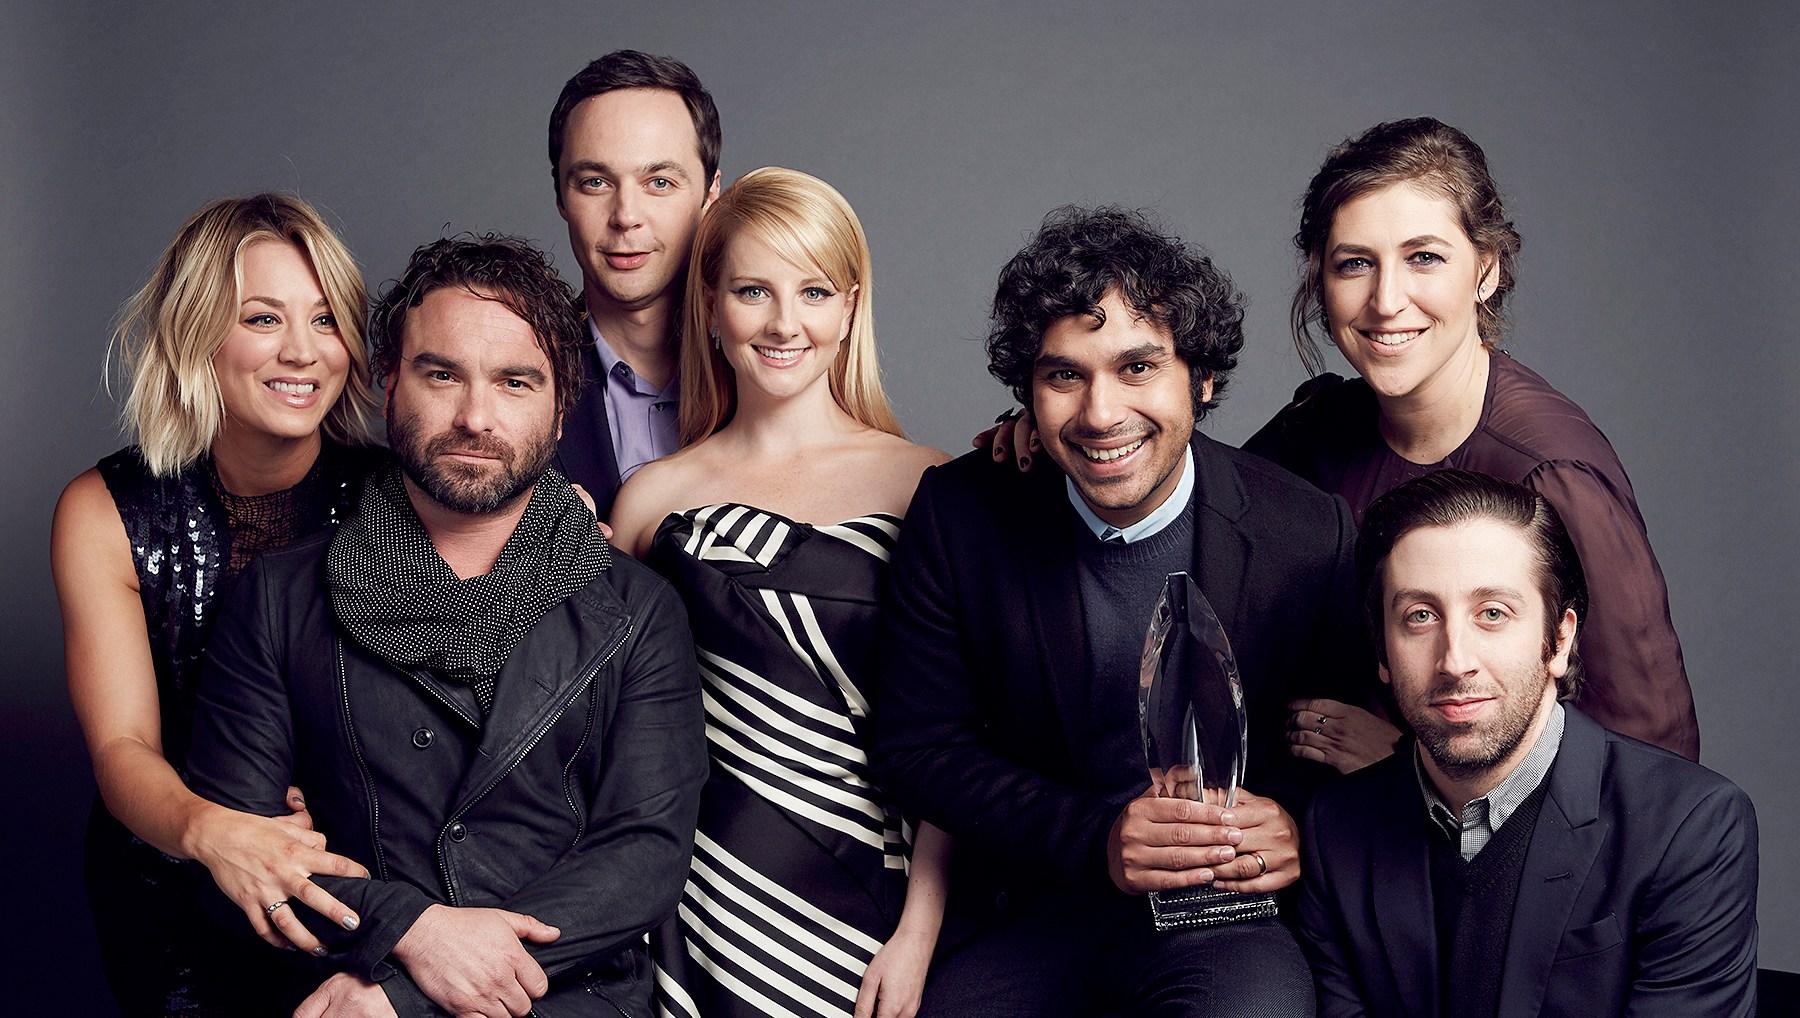 Kaley Cuoco Shares Sad Reaction To Big Bang Theory S Cancellation